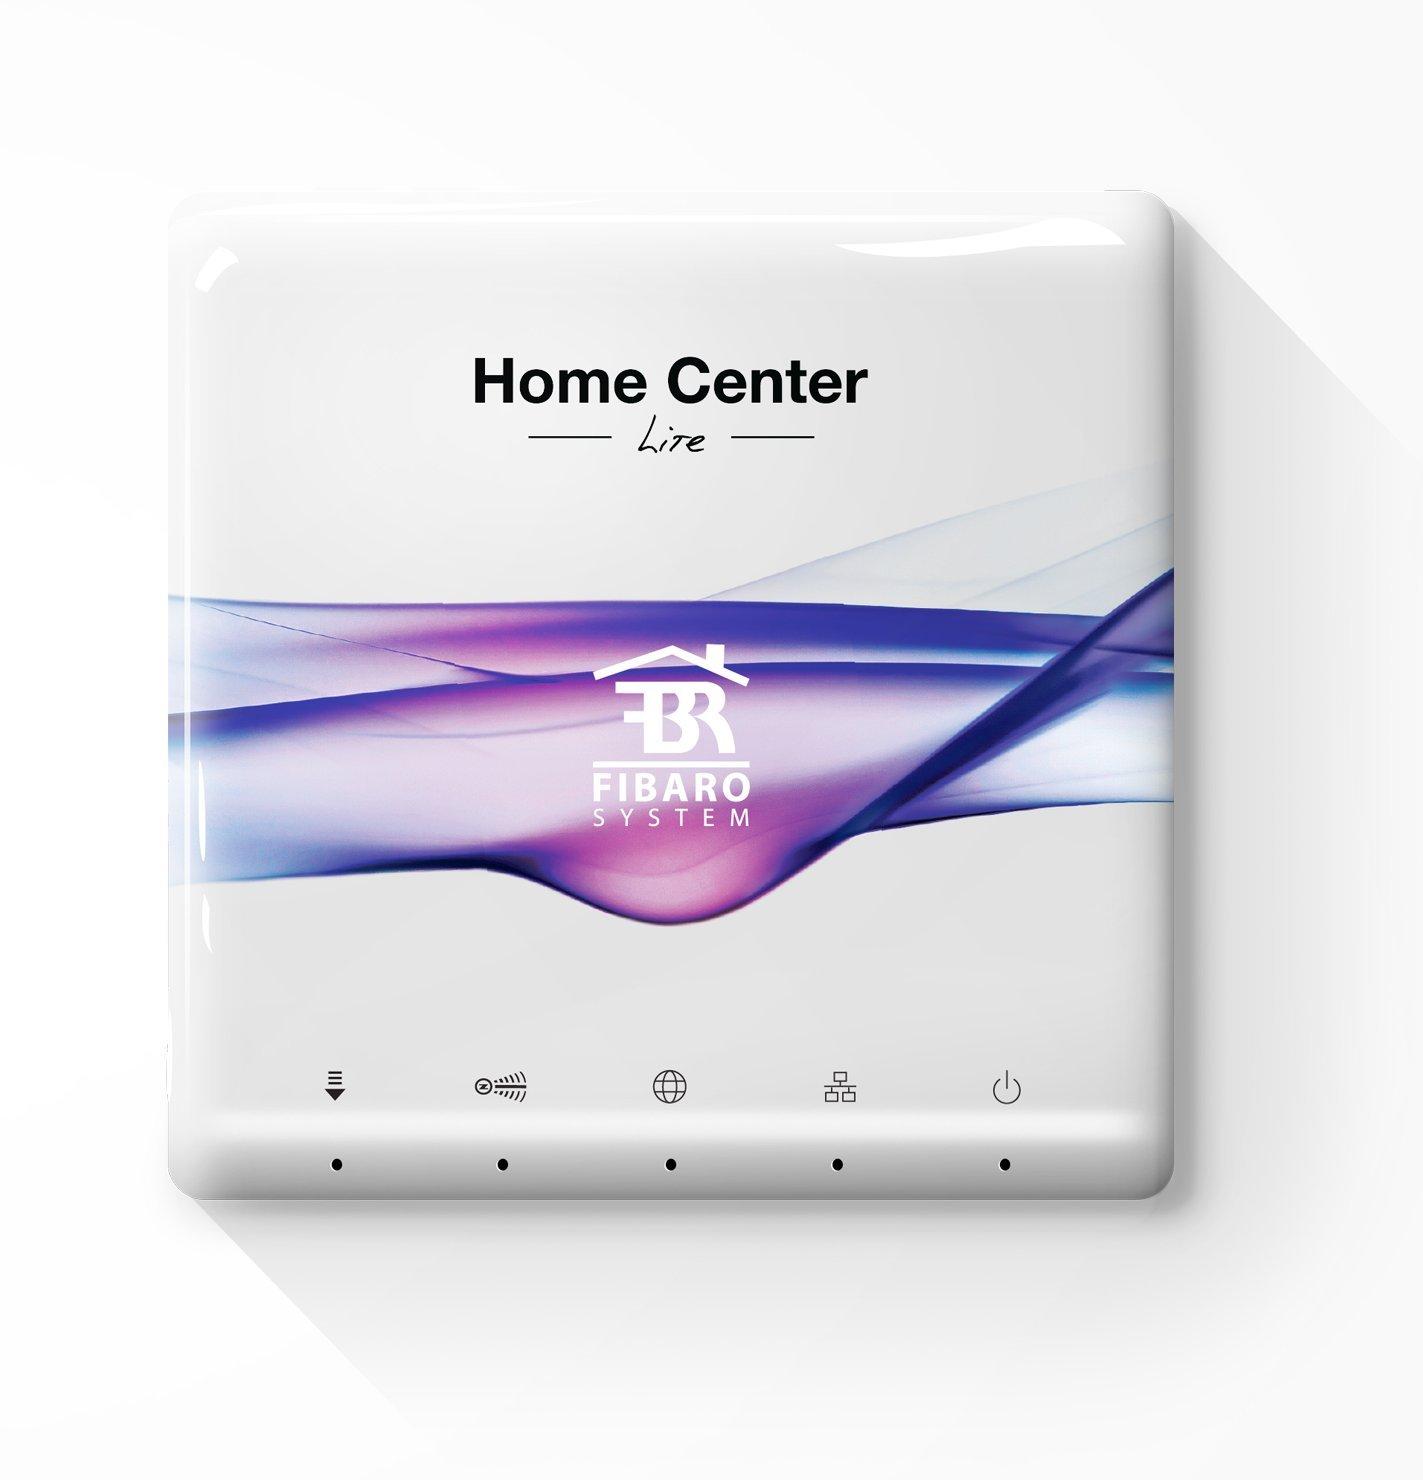 Plateado Fibaro FIB/_FGHCL Sistema de Control del Hogar Home Center Lite